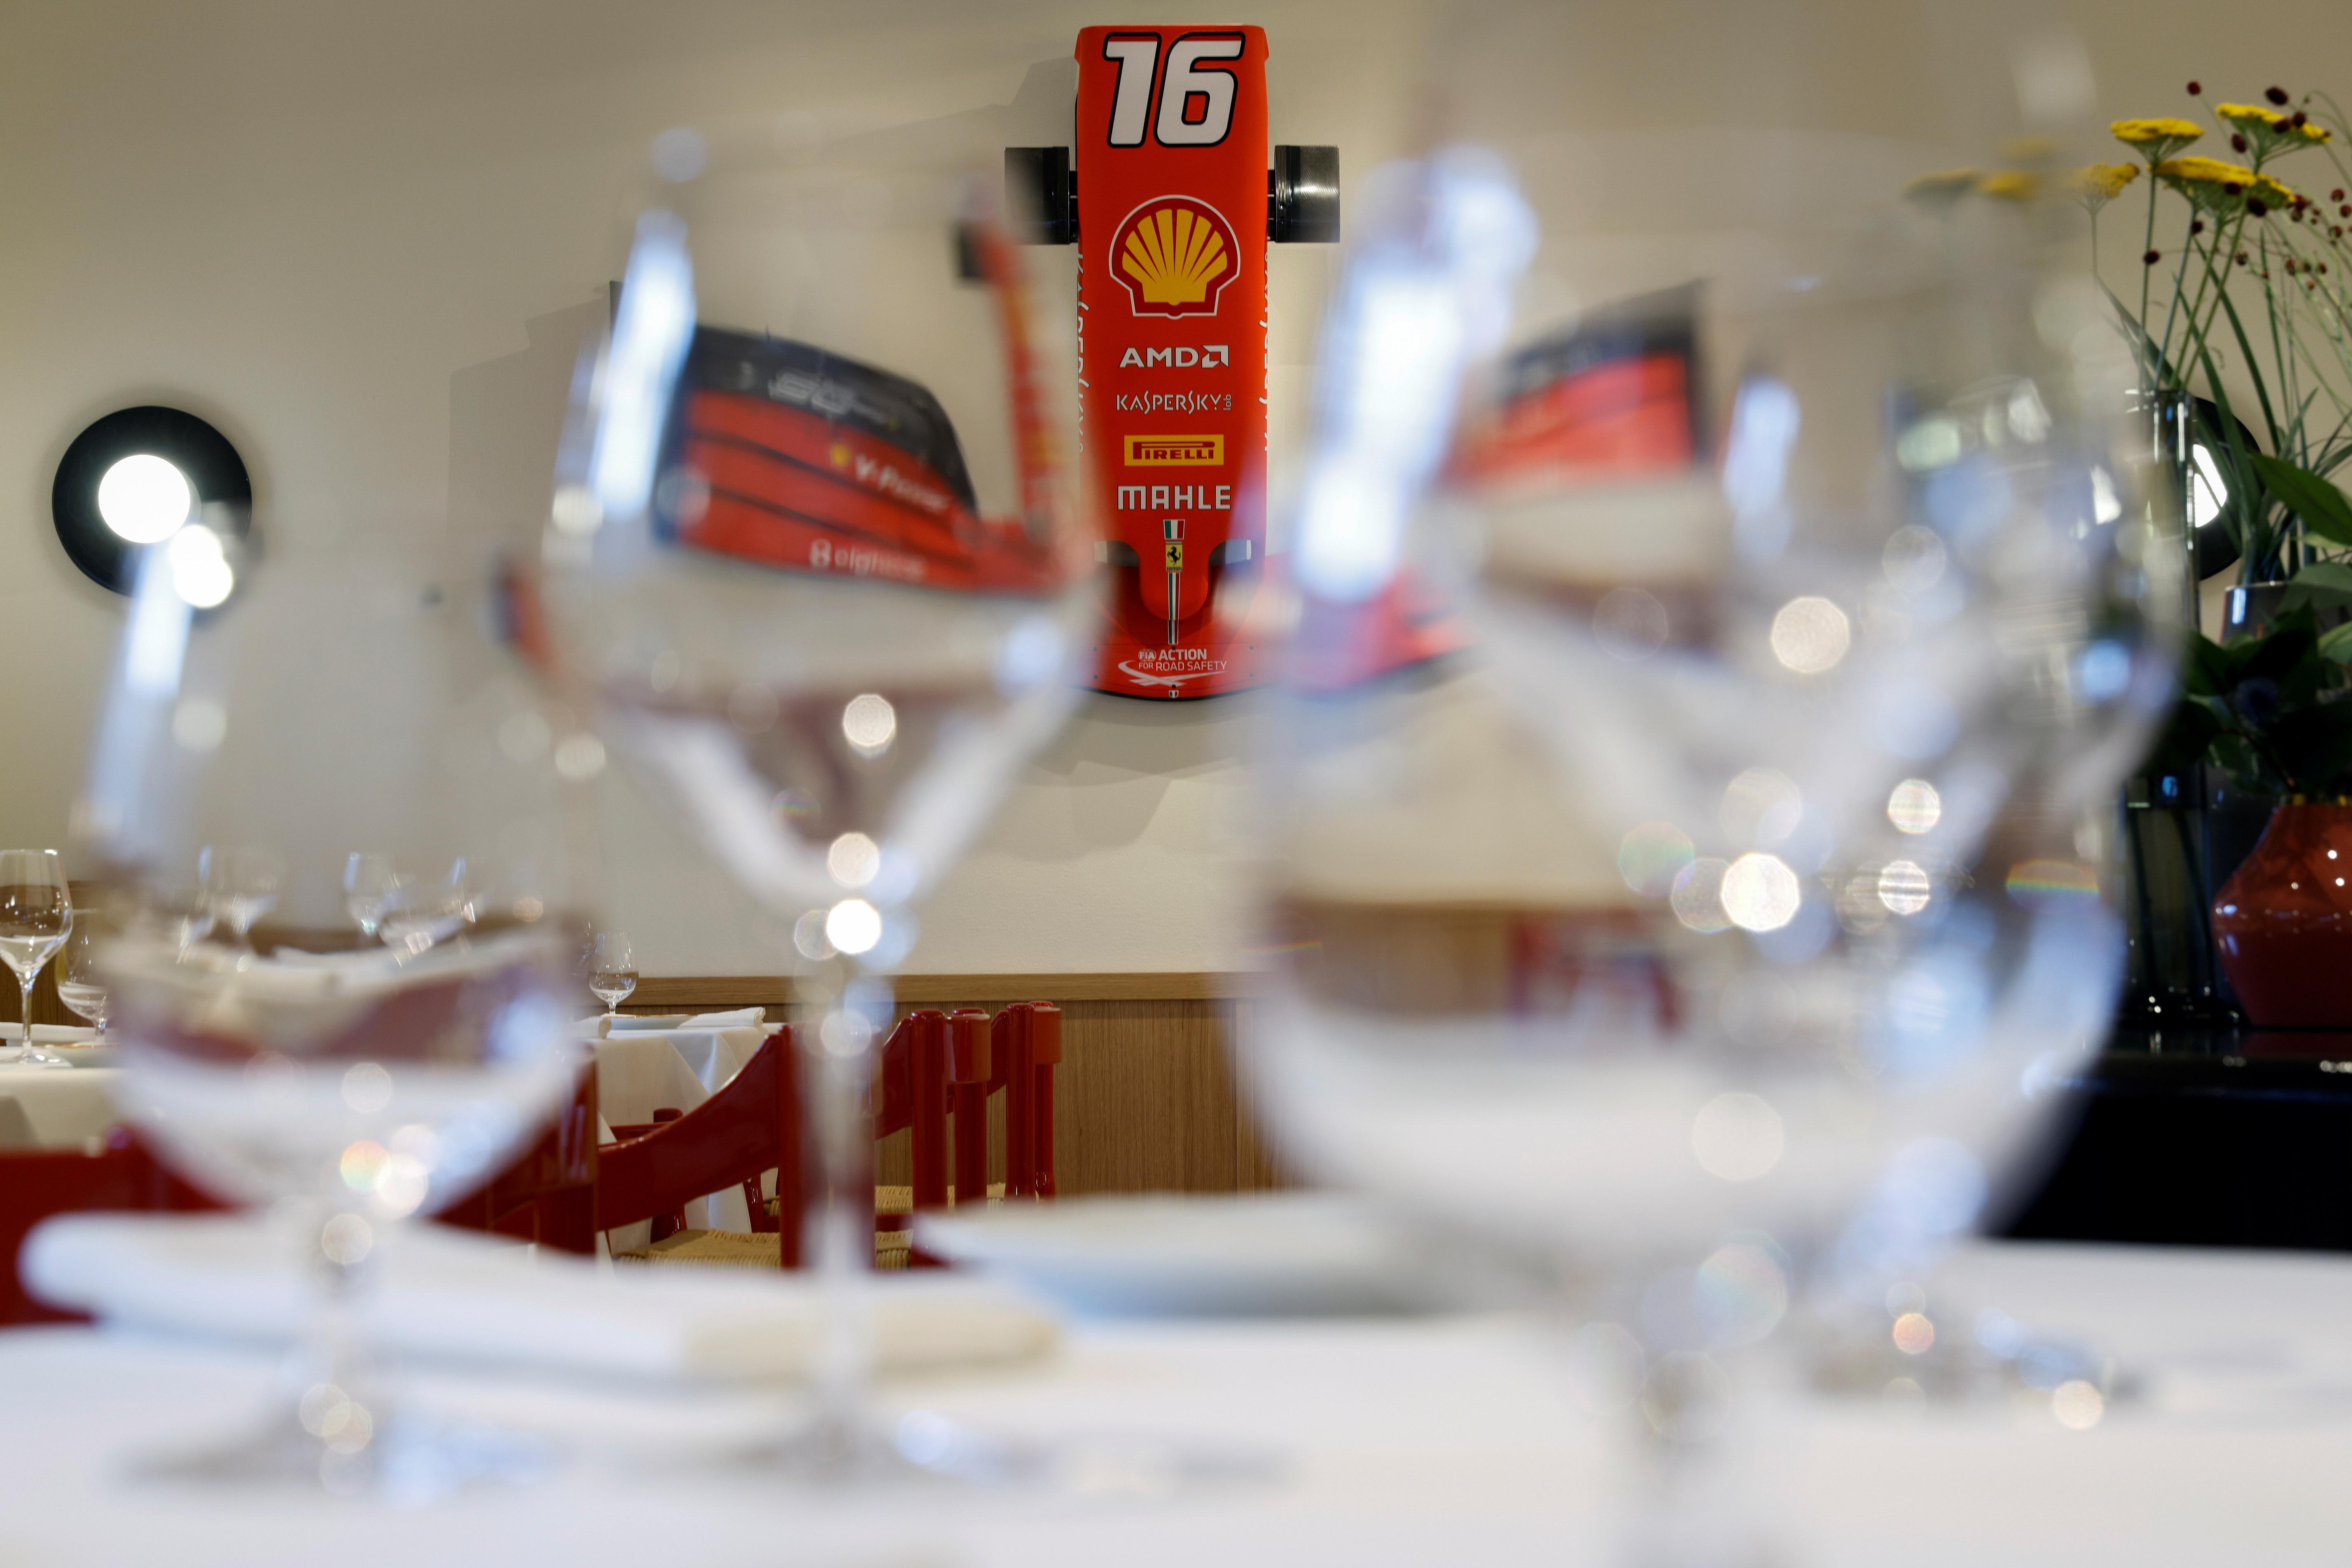 A Ferrari's F1 front-end is displayed at the Ferrari's restaurant 'Cavallino' run by Michelin-starred chef Massimo Bottura in Maranello, Italy, June 8, 2021. Picture taken June 8, 2021. REUTERS/Guglielmo Mangiapane